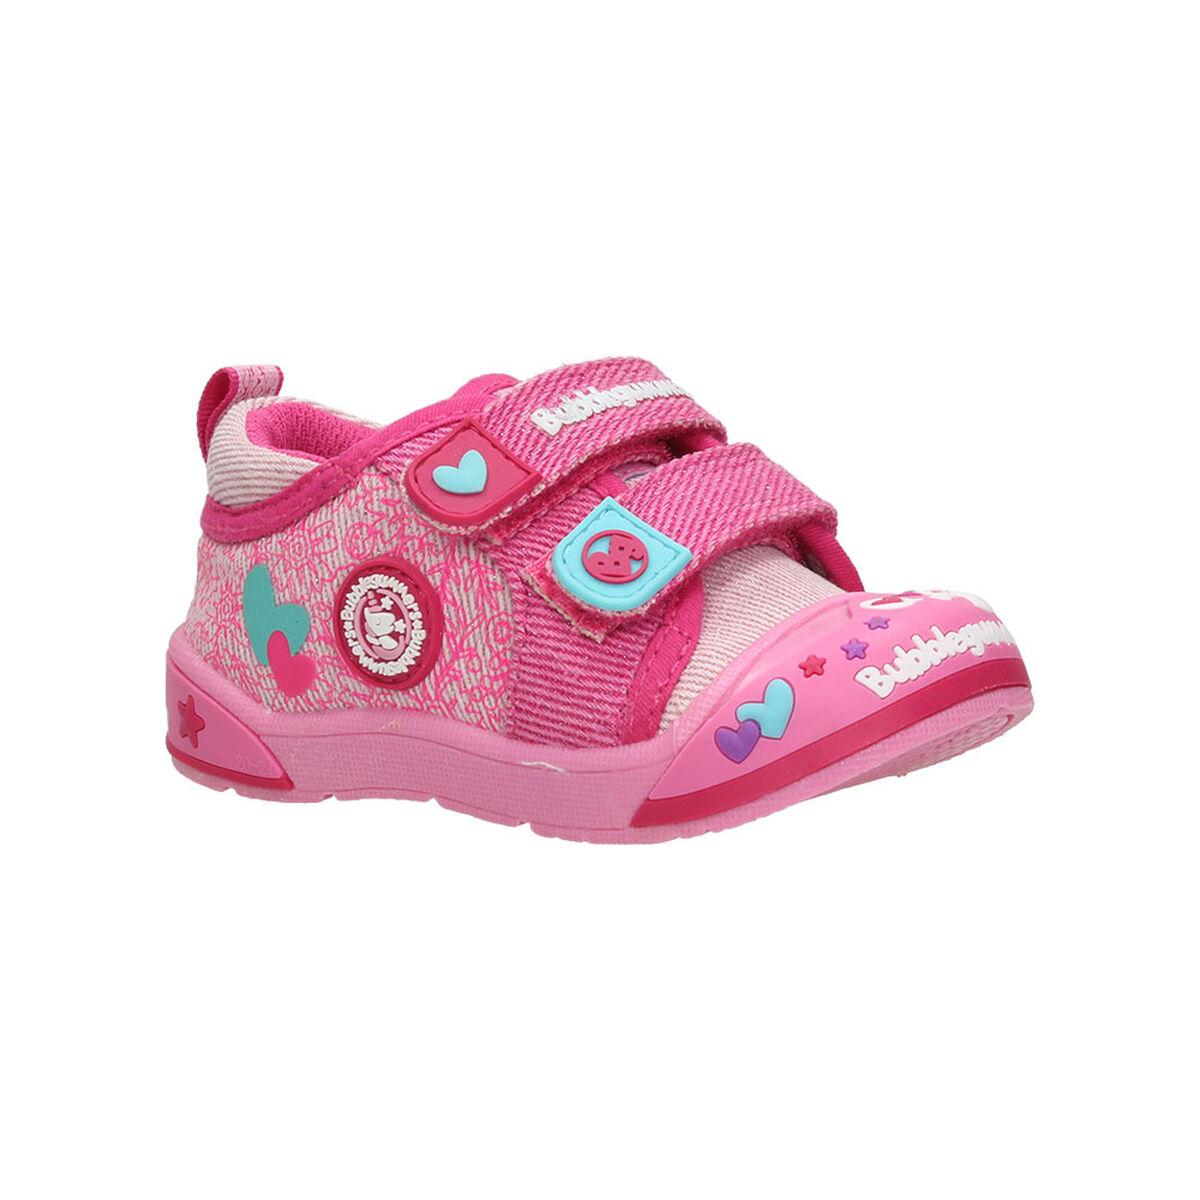 Zapato Lona Niña Bubble Gummers Monky